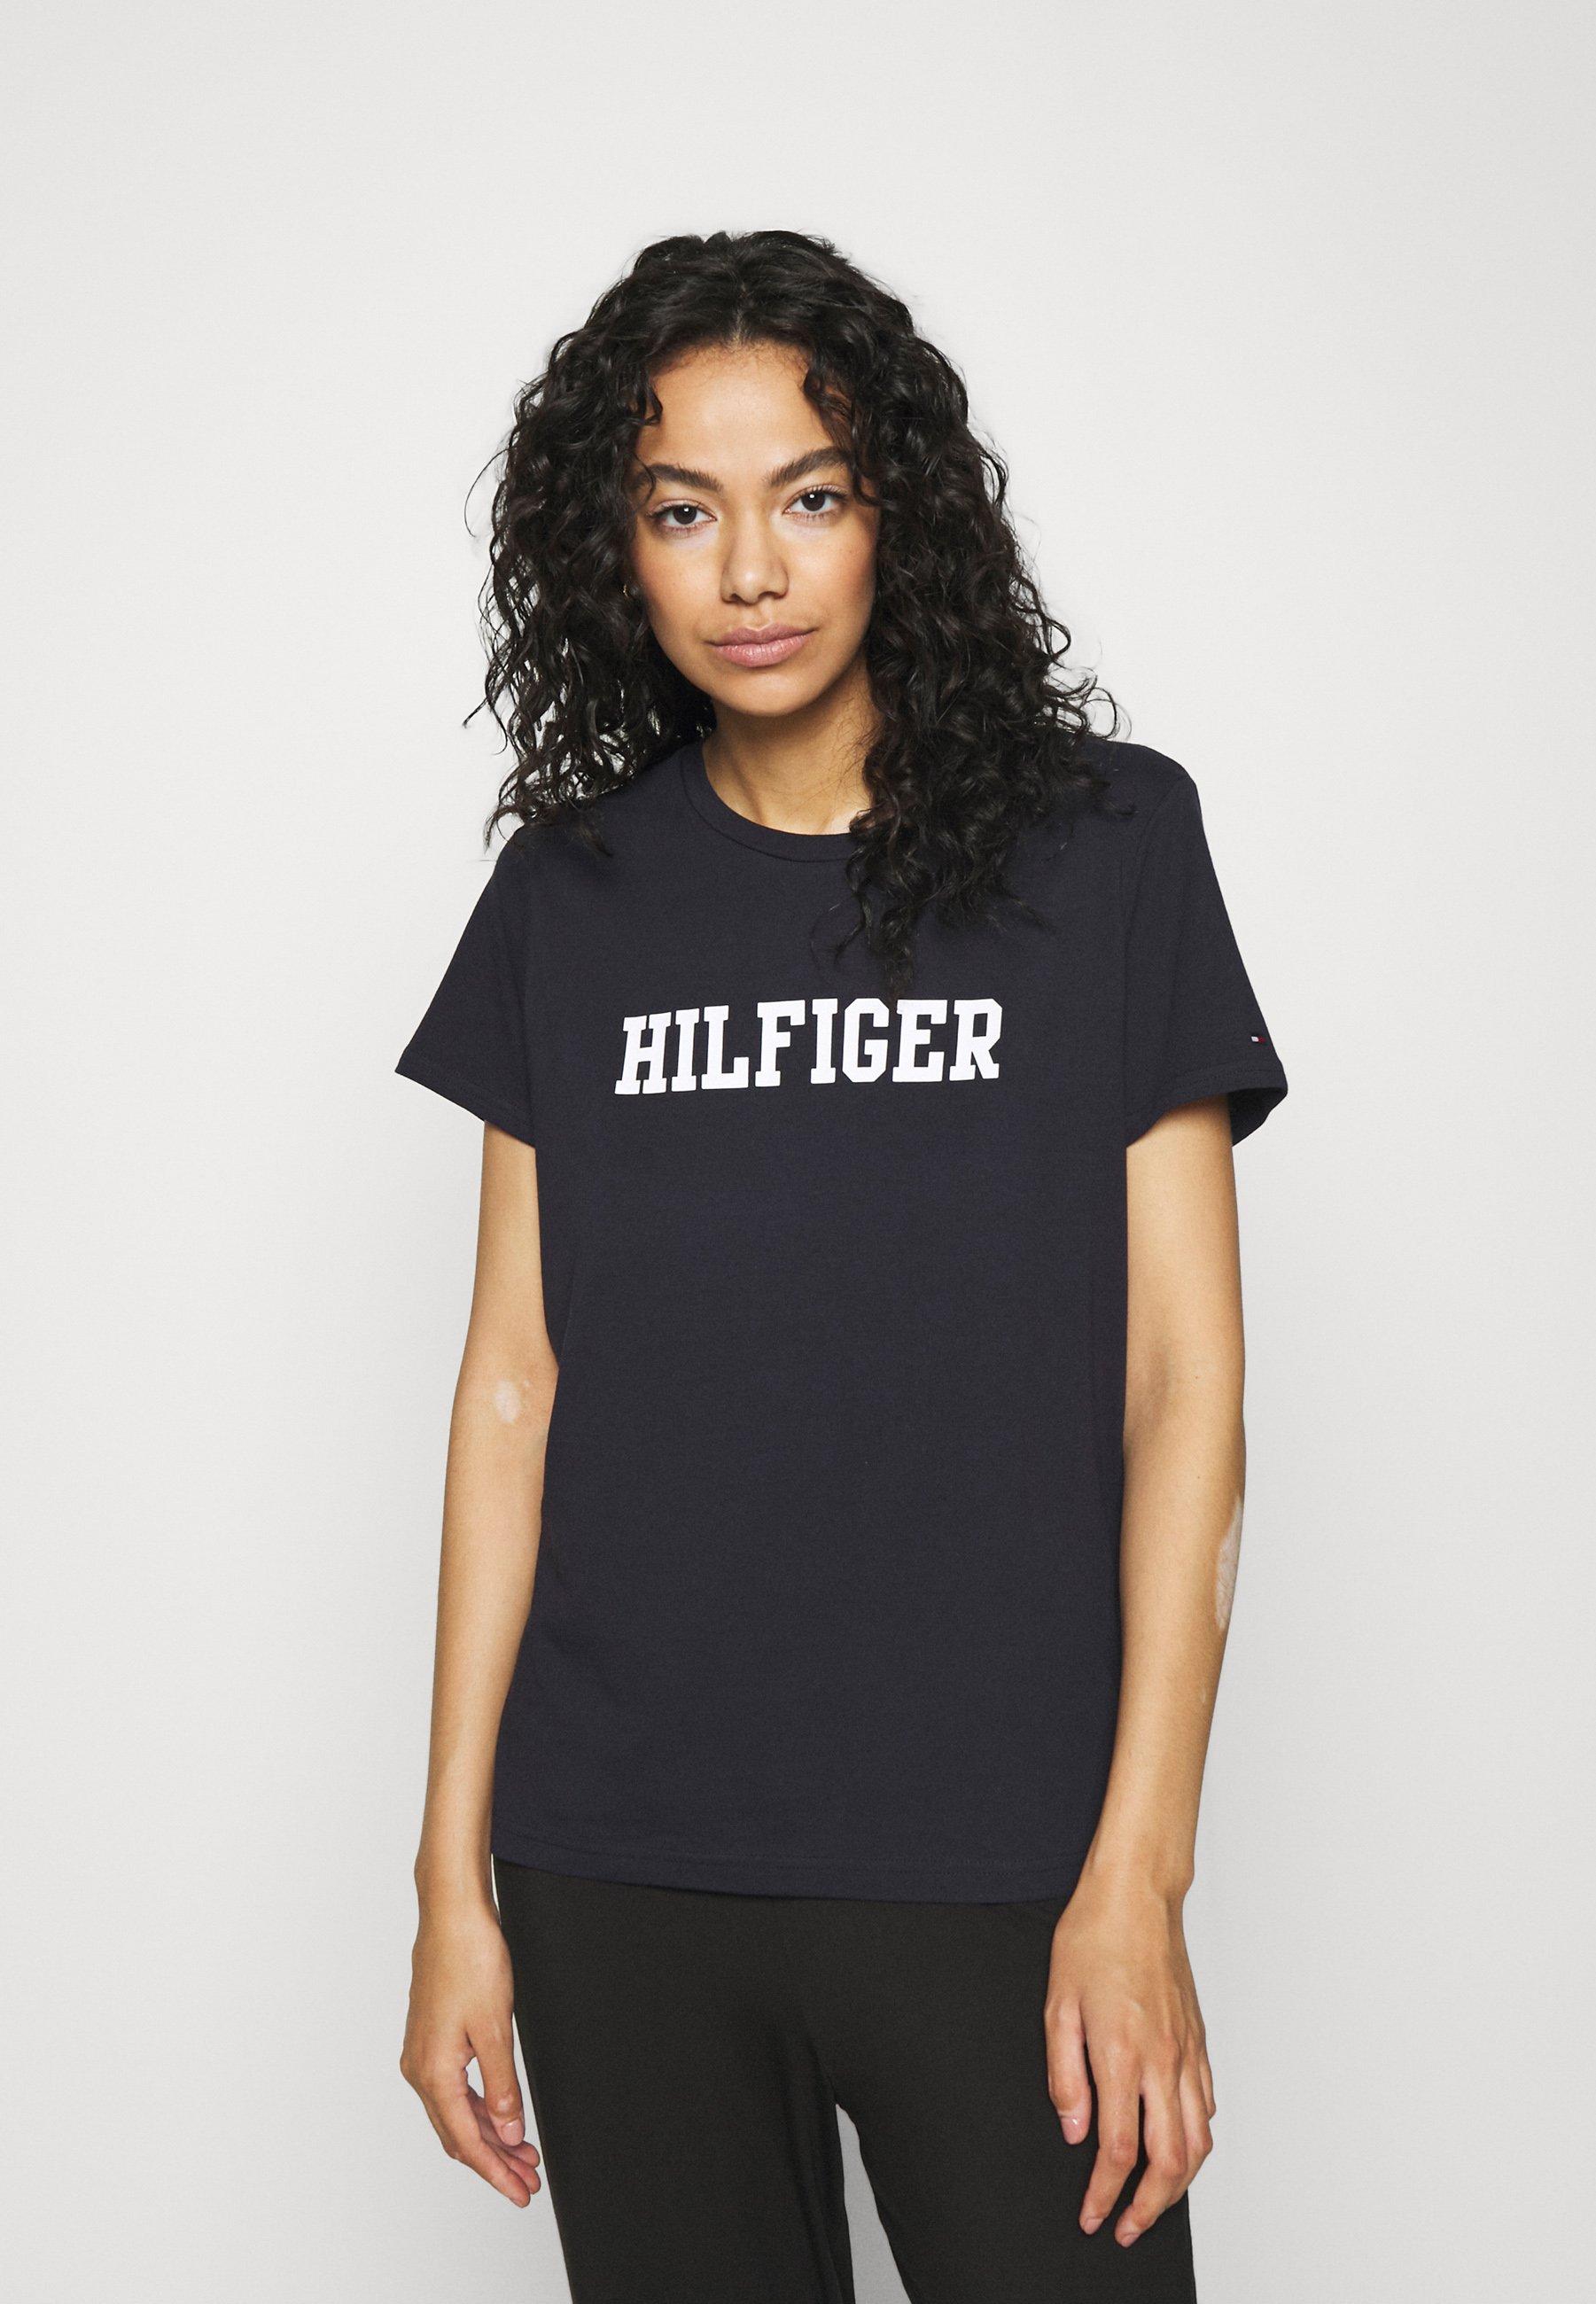 Damen ORIGINAL TEE - Nachtwäsche Shirt